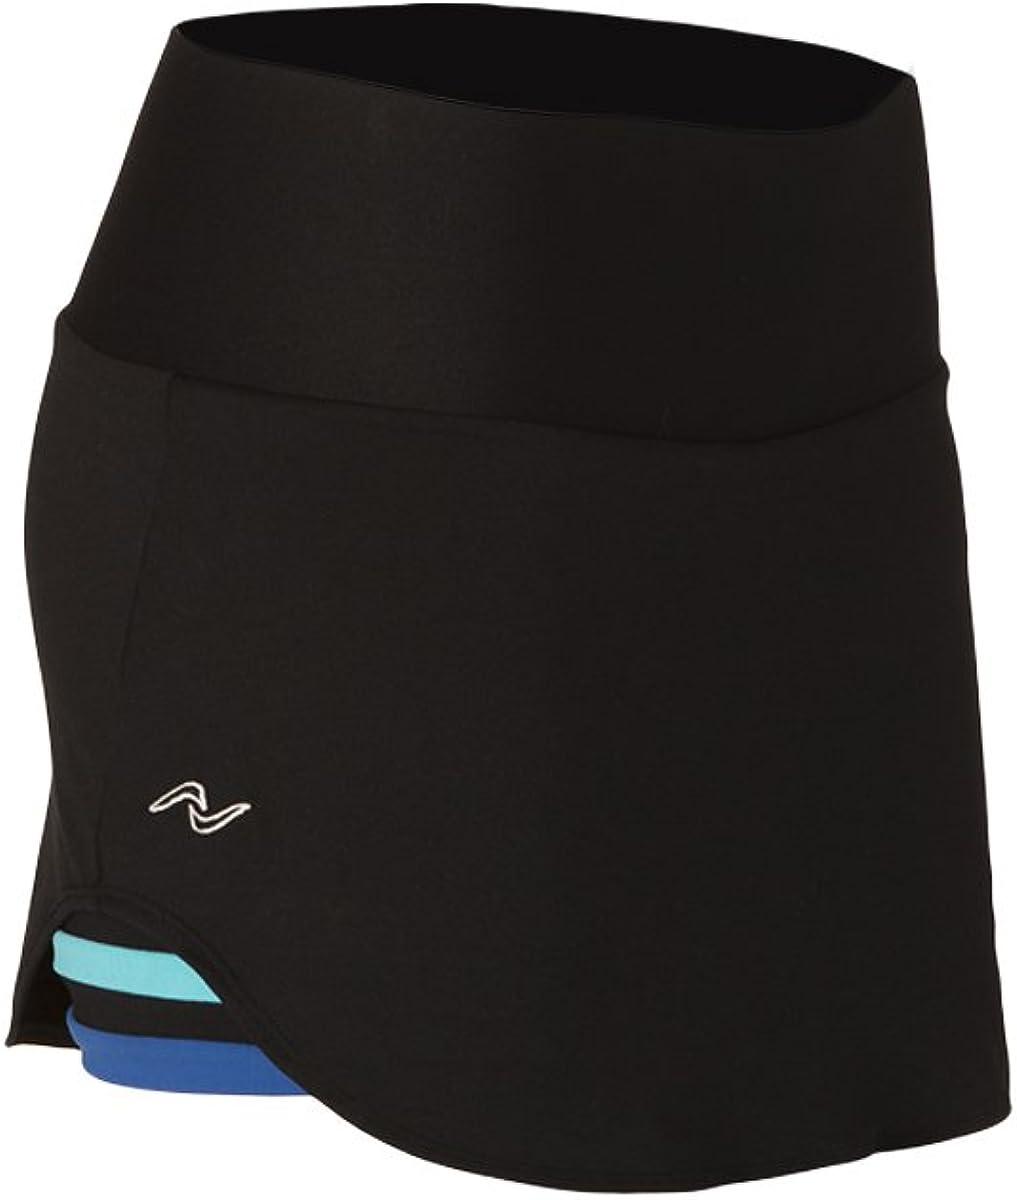 Naffta Tenis Padel - Falda-Short para Mujer, Color Negro/Azul ...